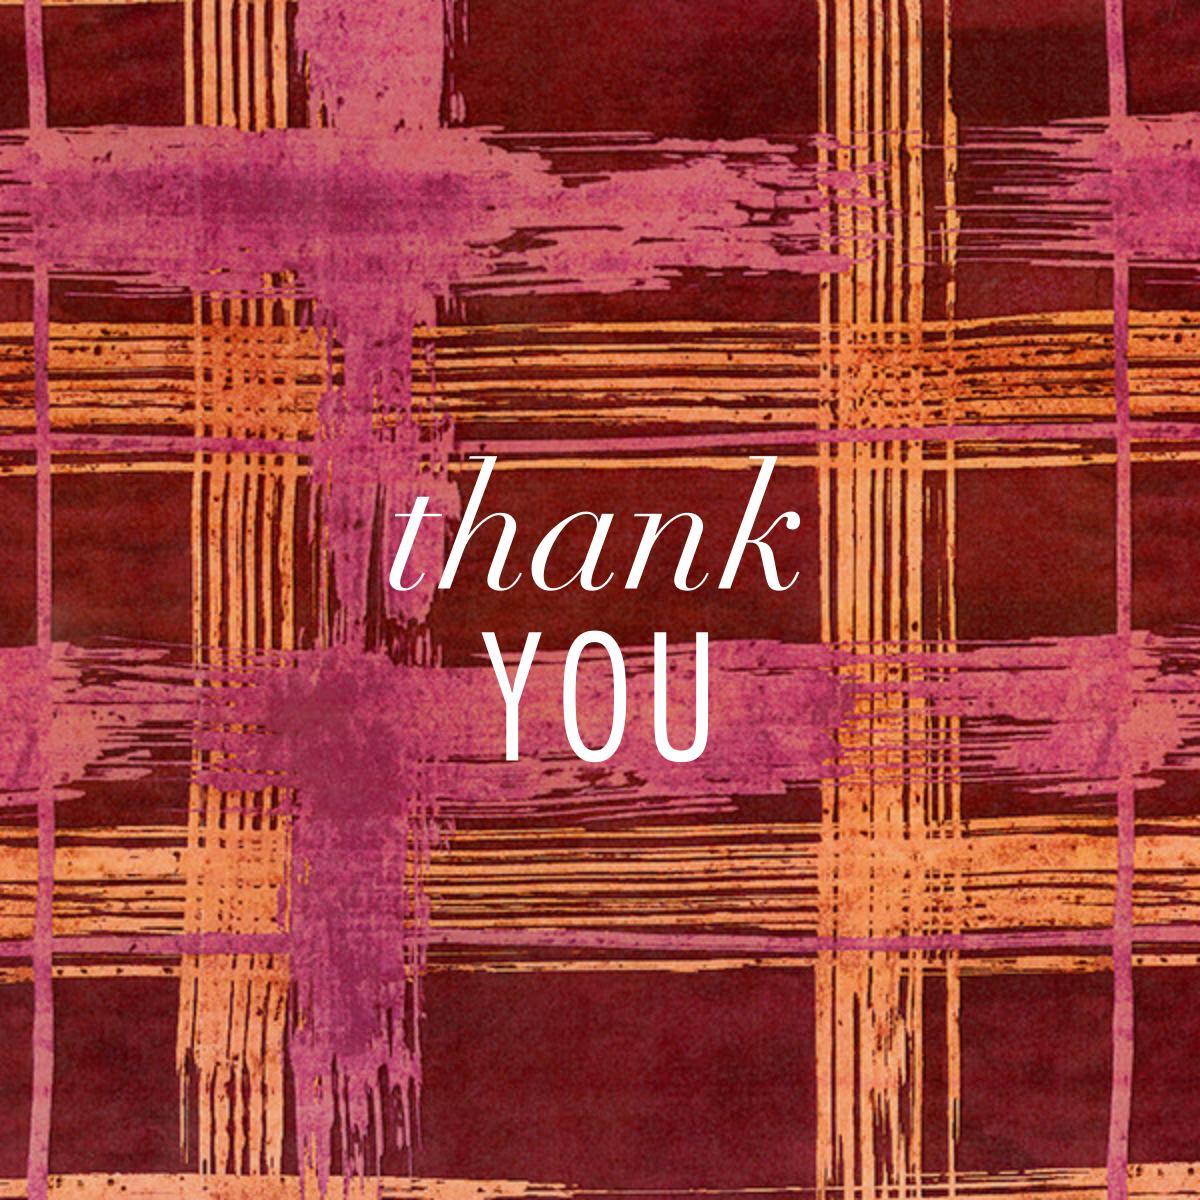 Different Strokes - Crimson - Kelly Wearstler - Thank you